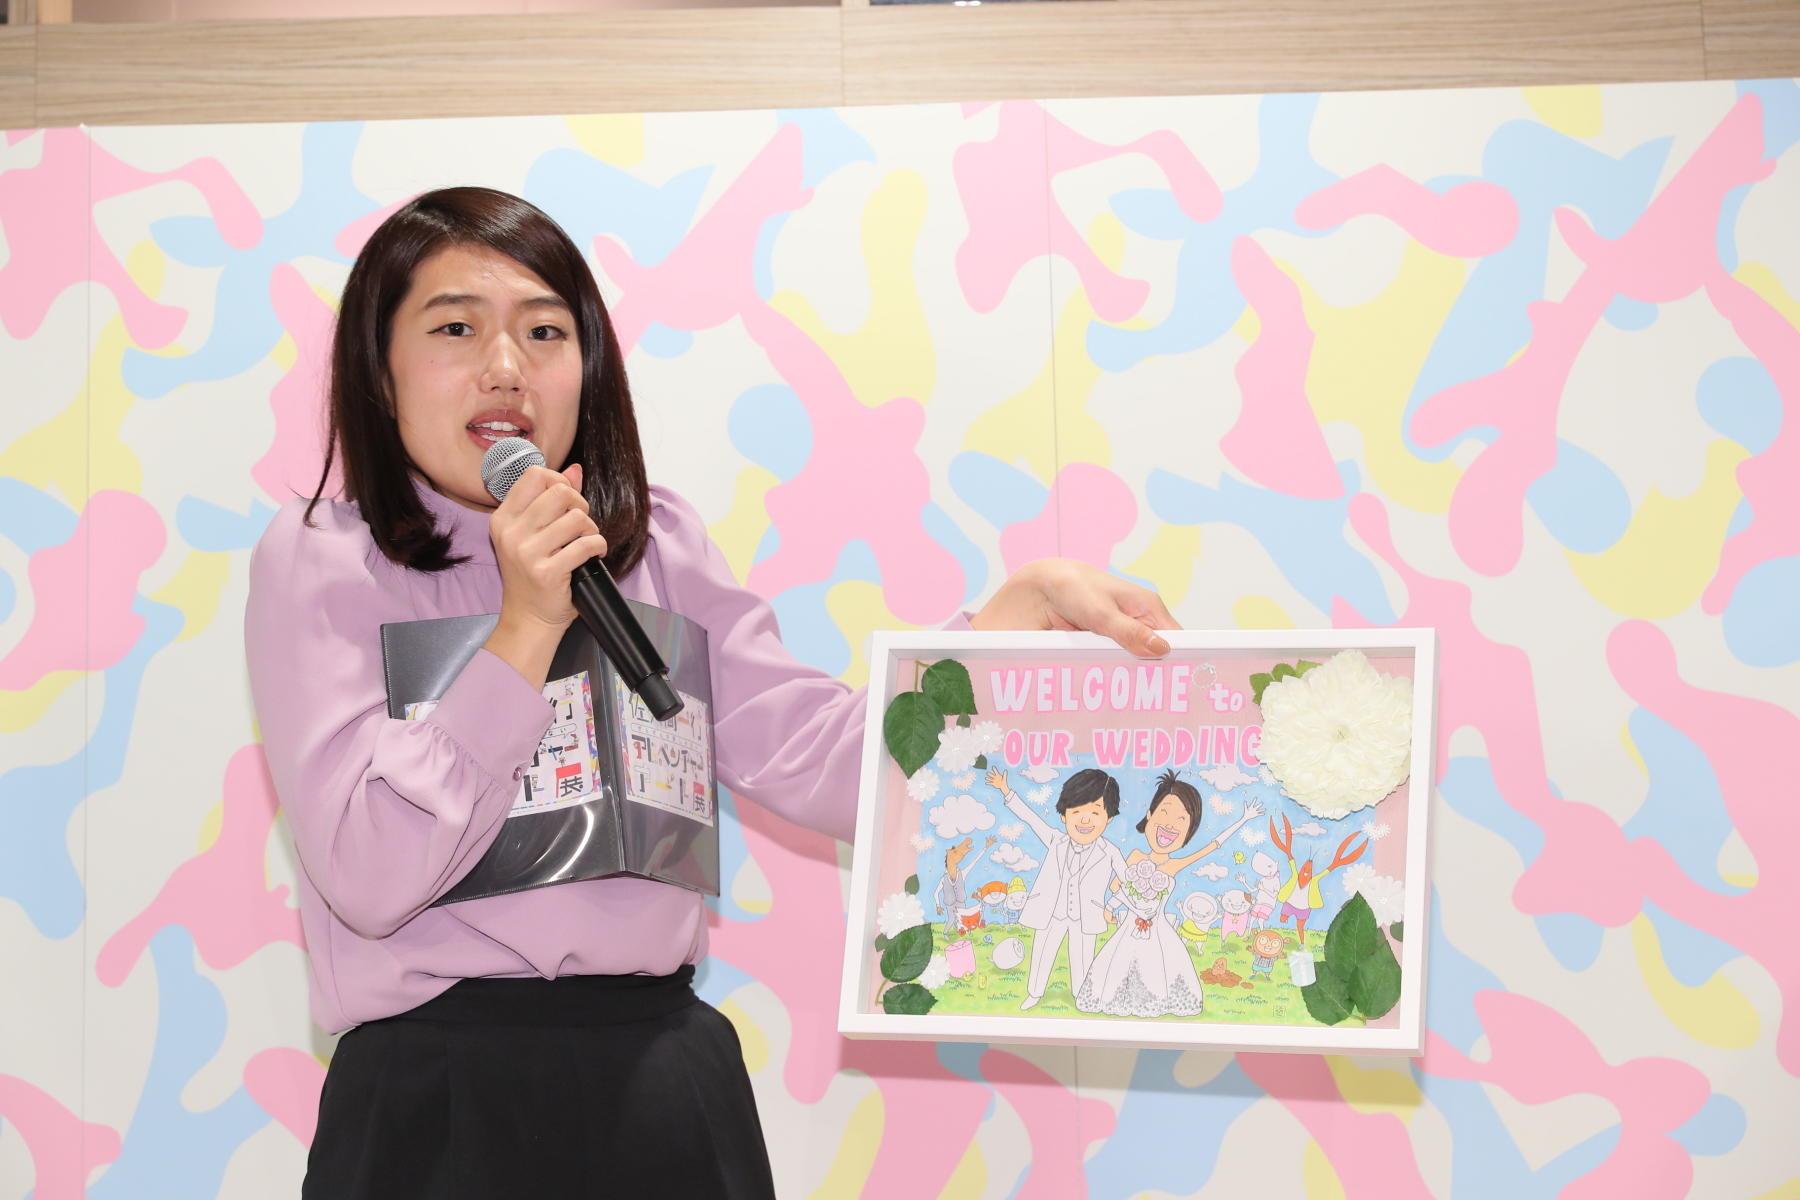 http://news.yoshimoto.co.jp/20180427001408-4e31a434a479de2a7ea2370763a3bb3e3fad07ac.jpg